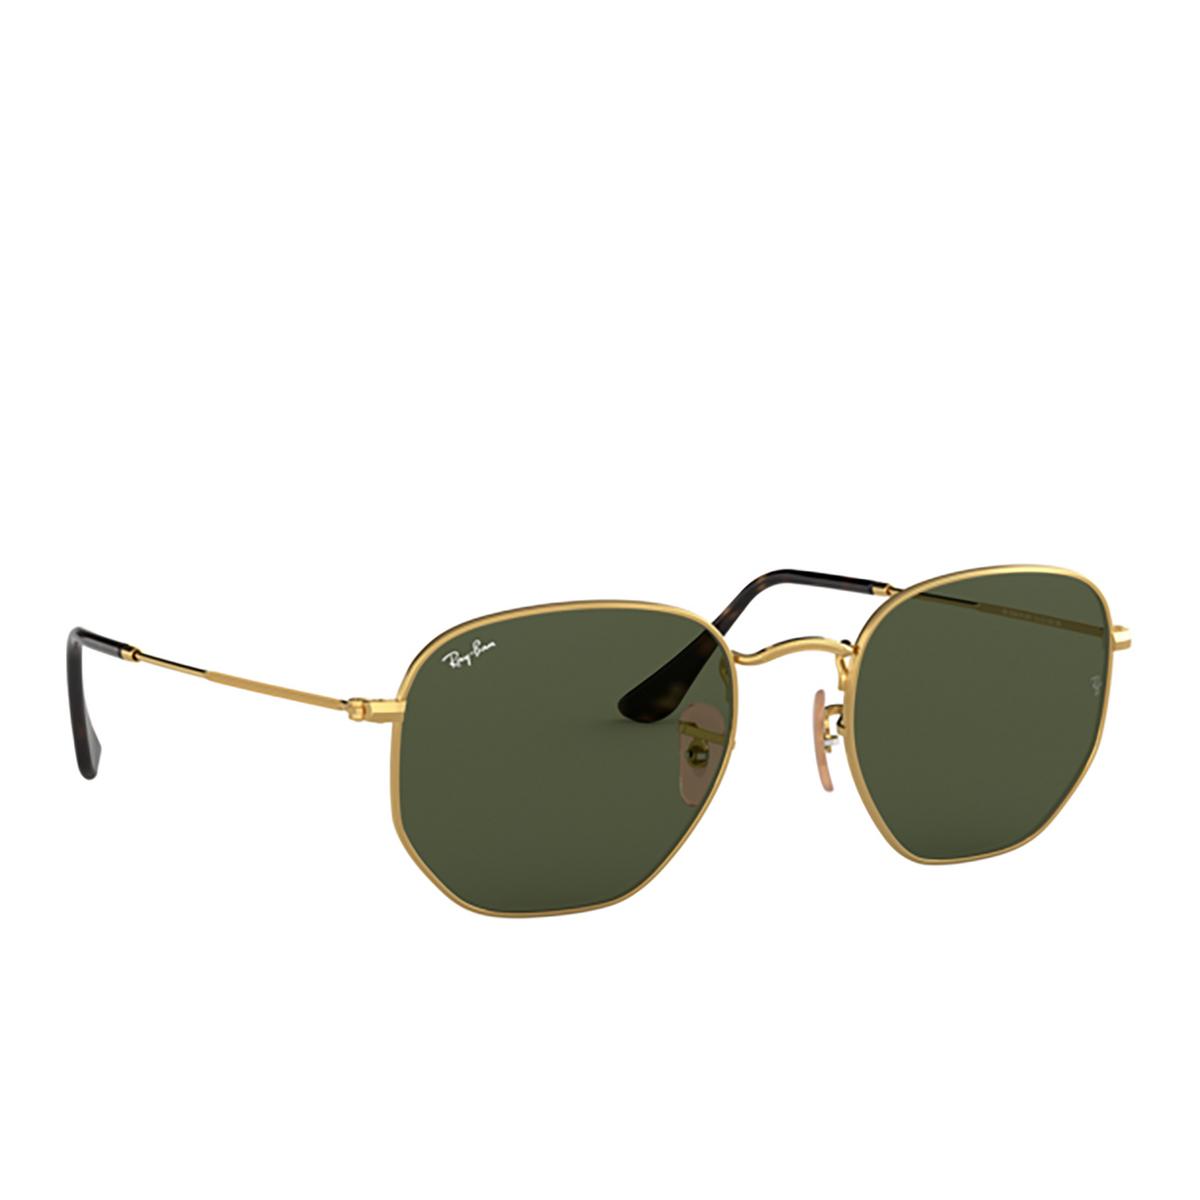 Ray-Ban® Irregular Sunglasses: Hexagonal RB3548N color Arista 001.